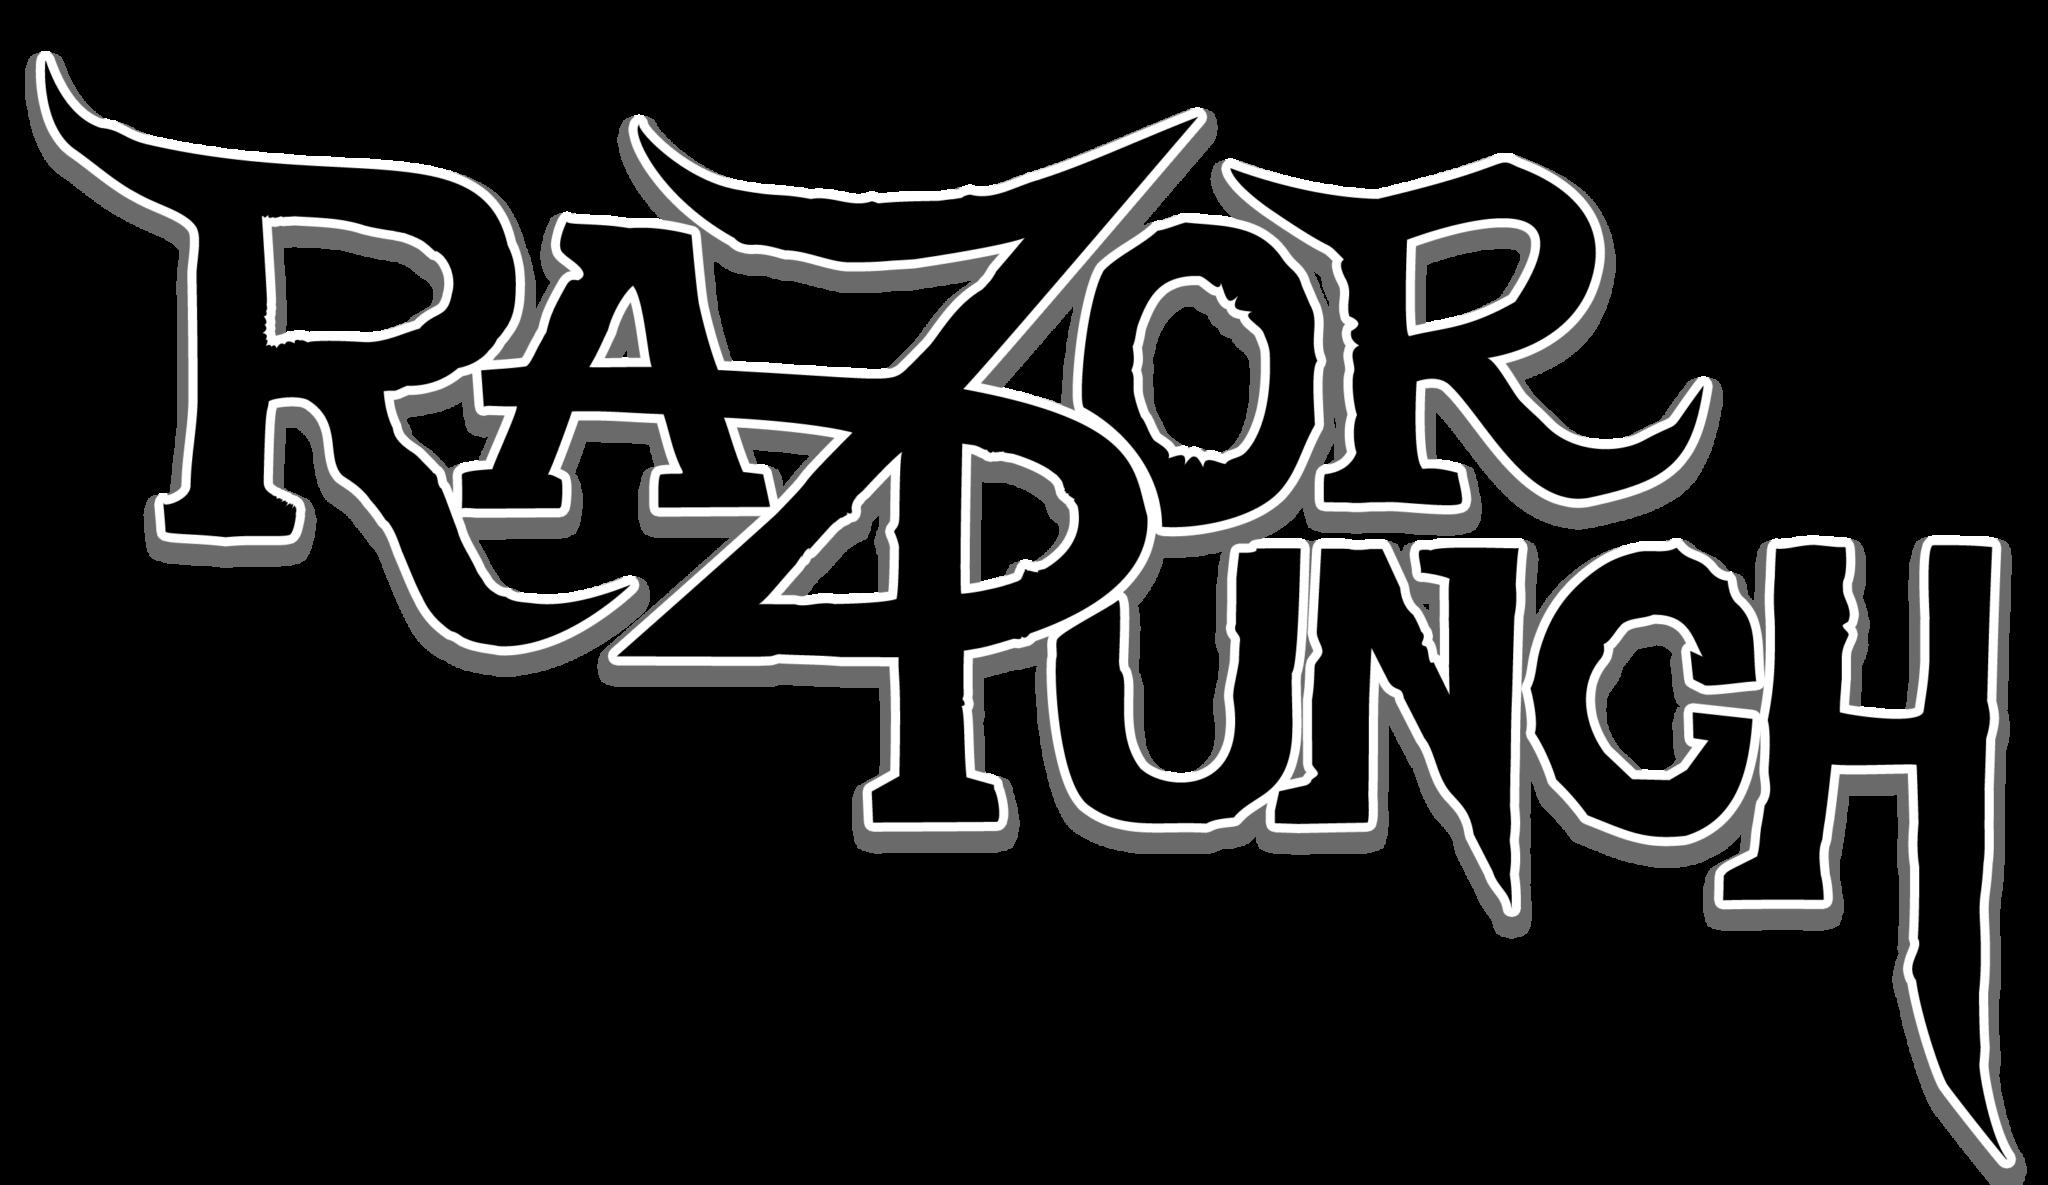 Razor Punch